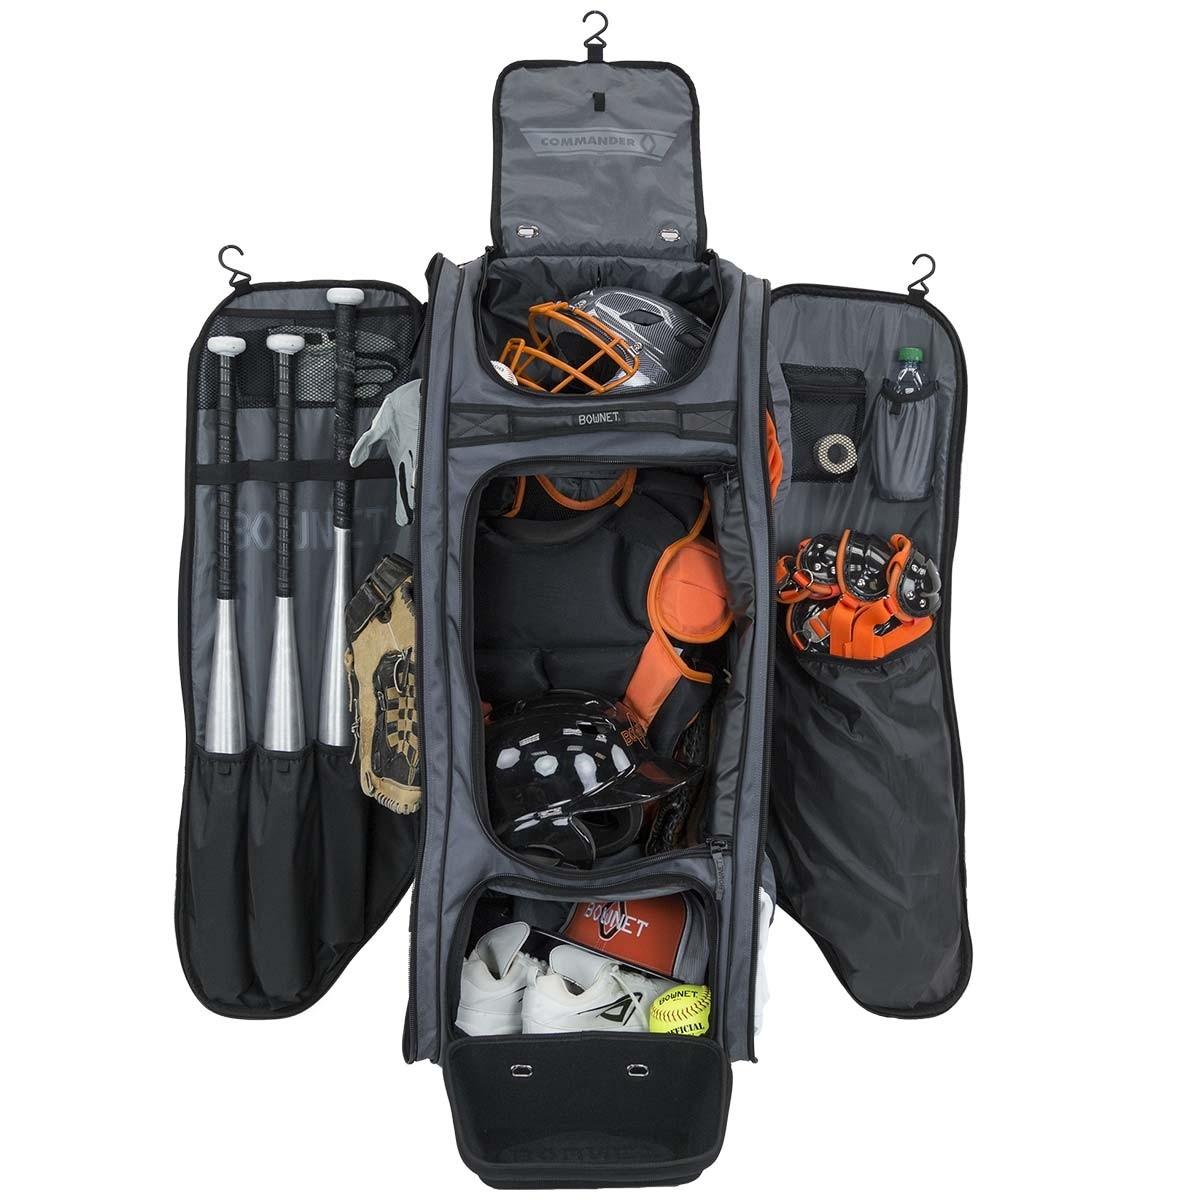 Bownet Commander Wheeled Catcher S Equipment Bag 38 X17